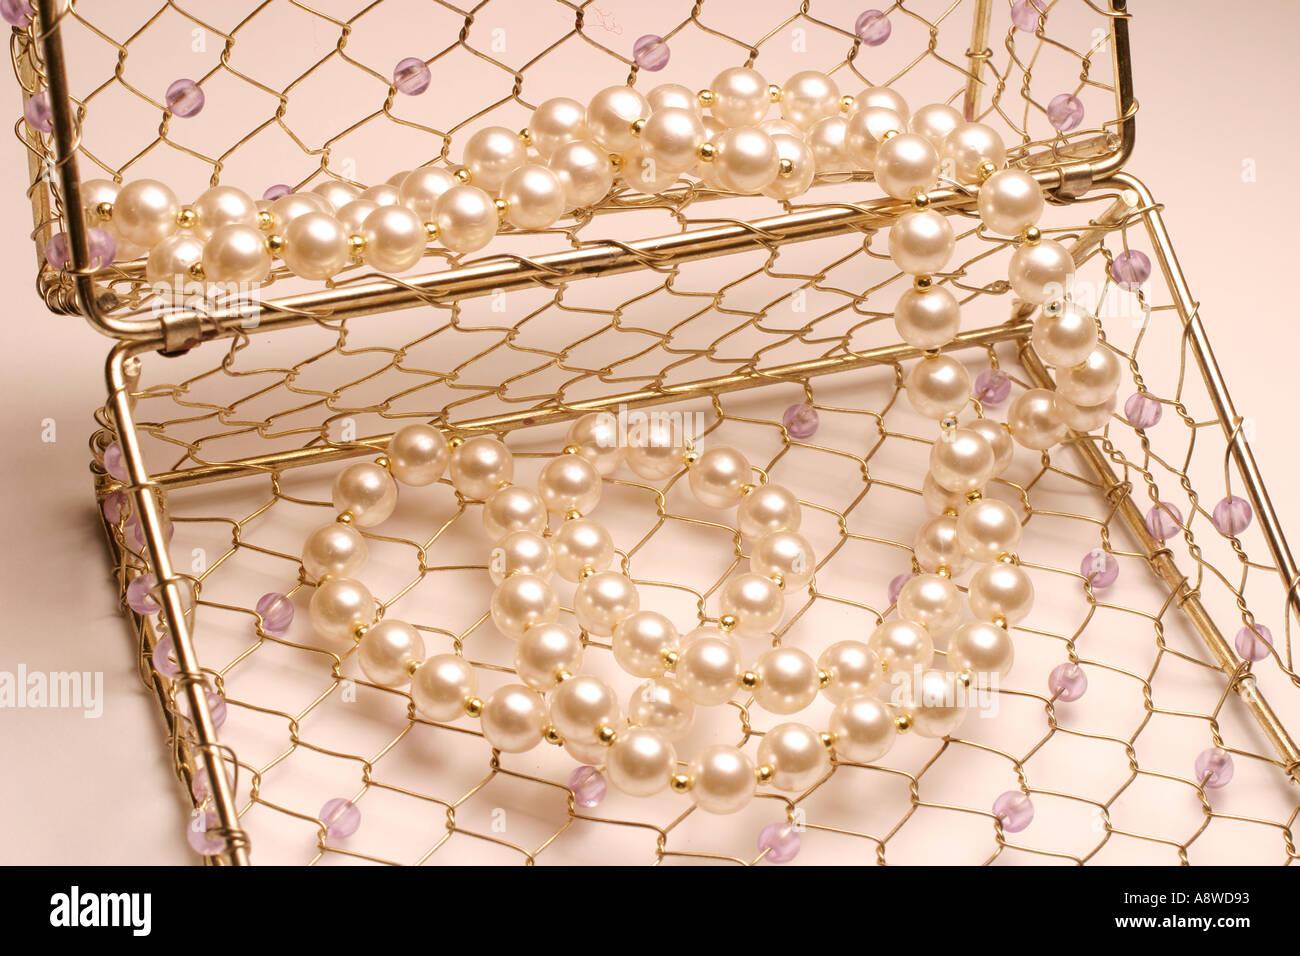 Pearl Necklace in Beaded Handbag - Stock Image